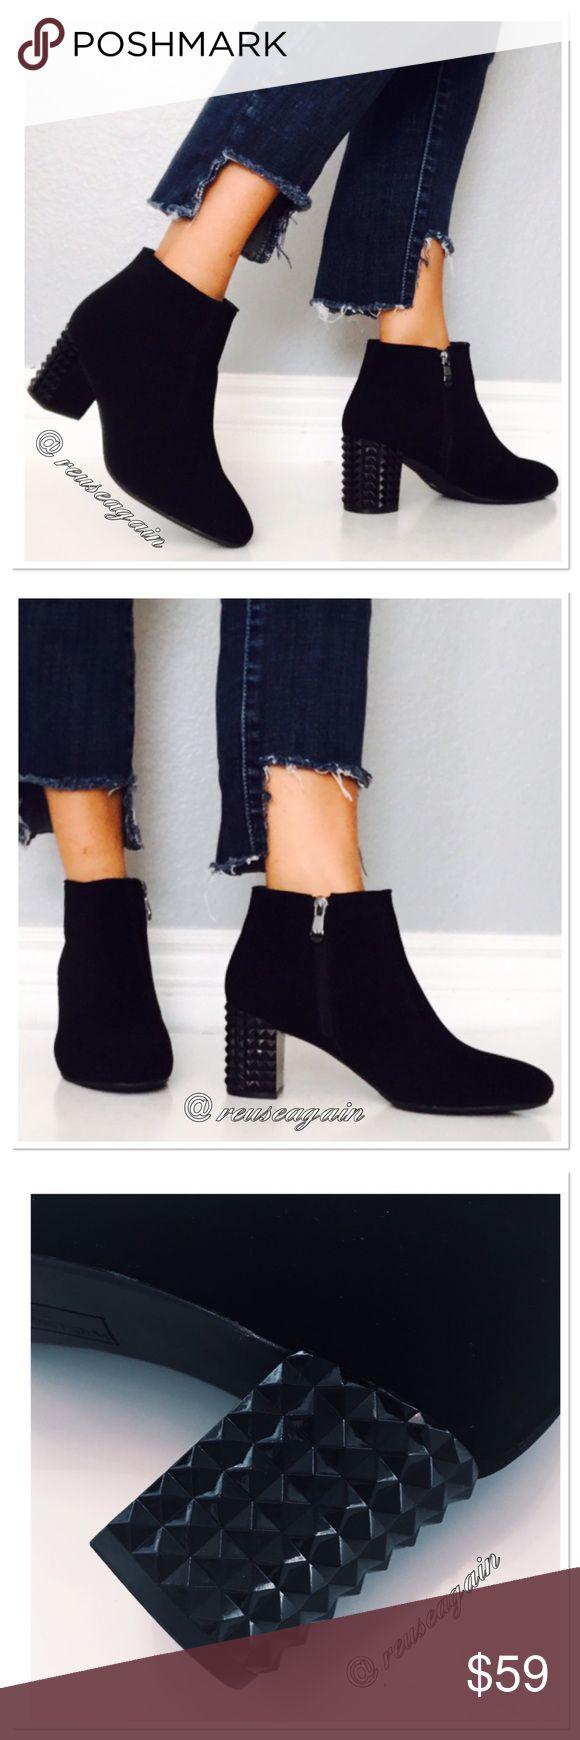 NWOB Madeline Stuart Ankle Boots